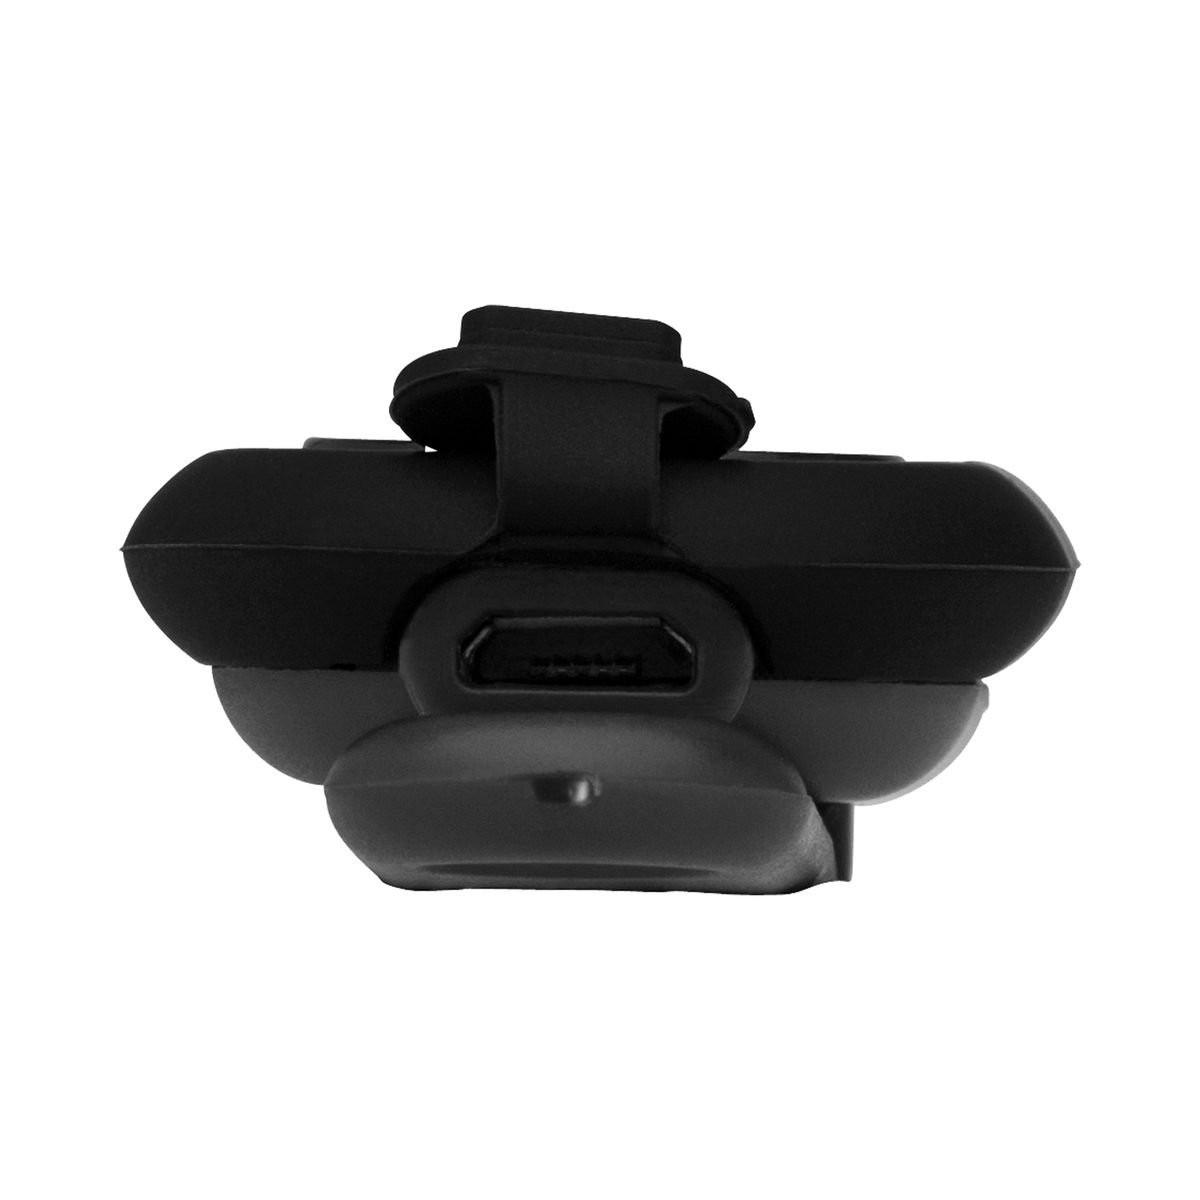 Bluetooth®-Adapter mit Kopfhörer REFLECTS-COLMA BLACK, Ansicht 4